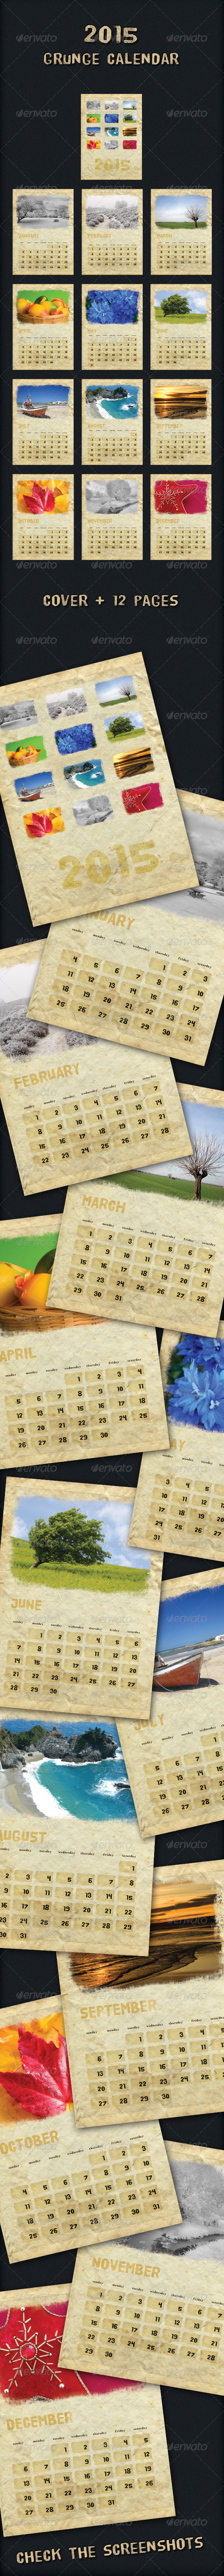 2015 Grunge Calendar - Calendars Stationery